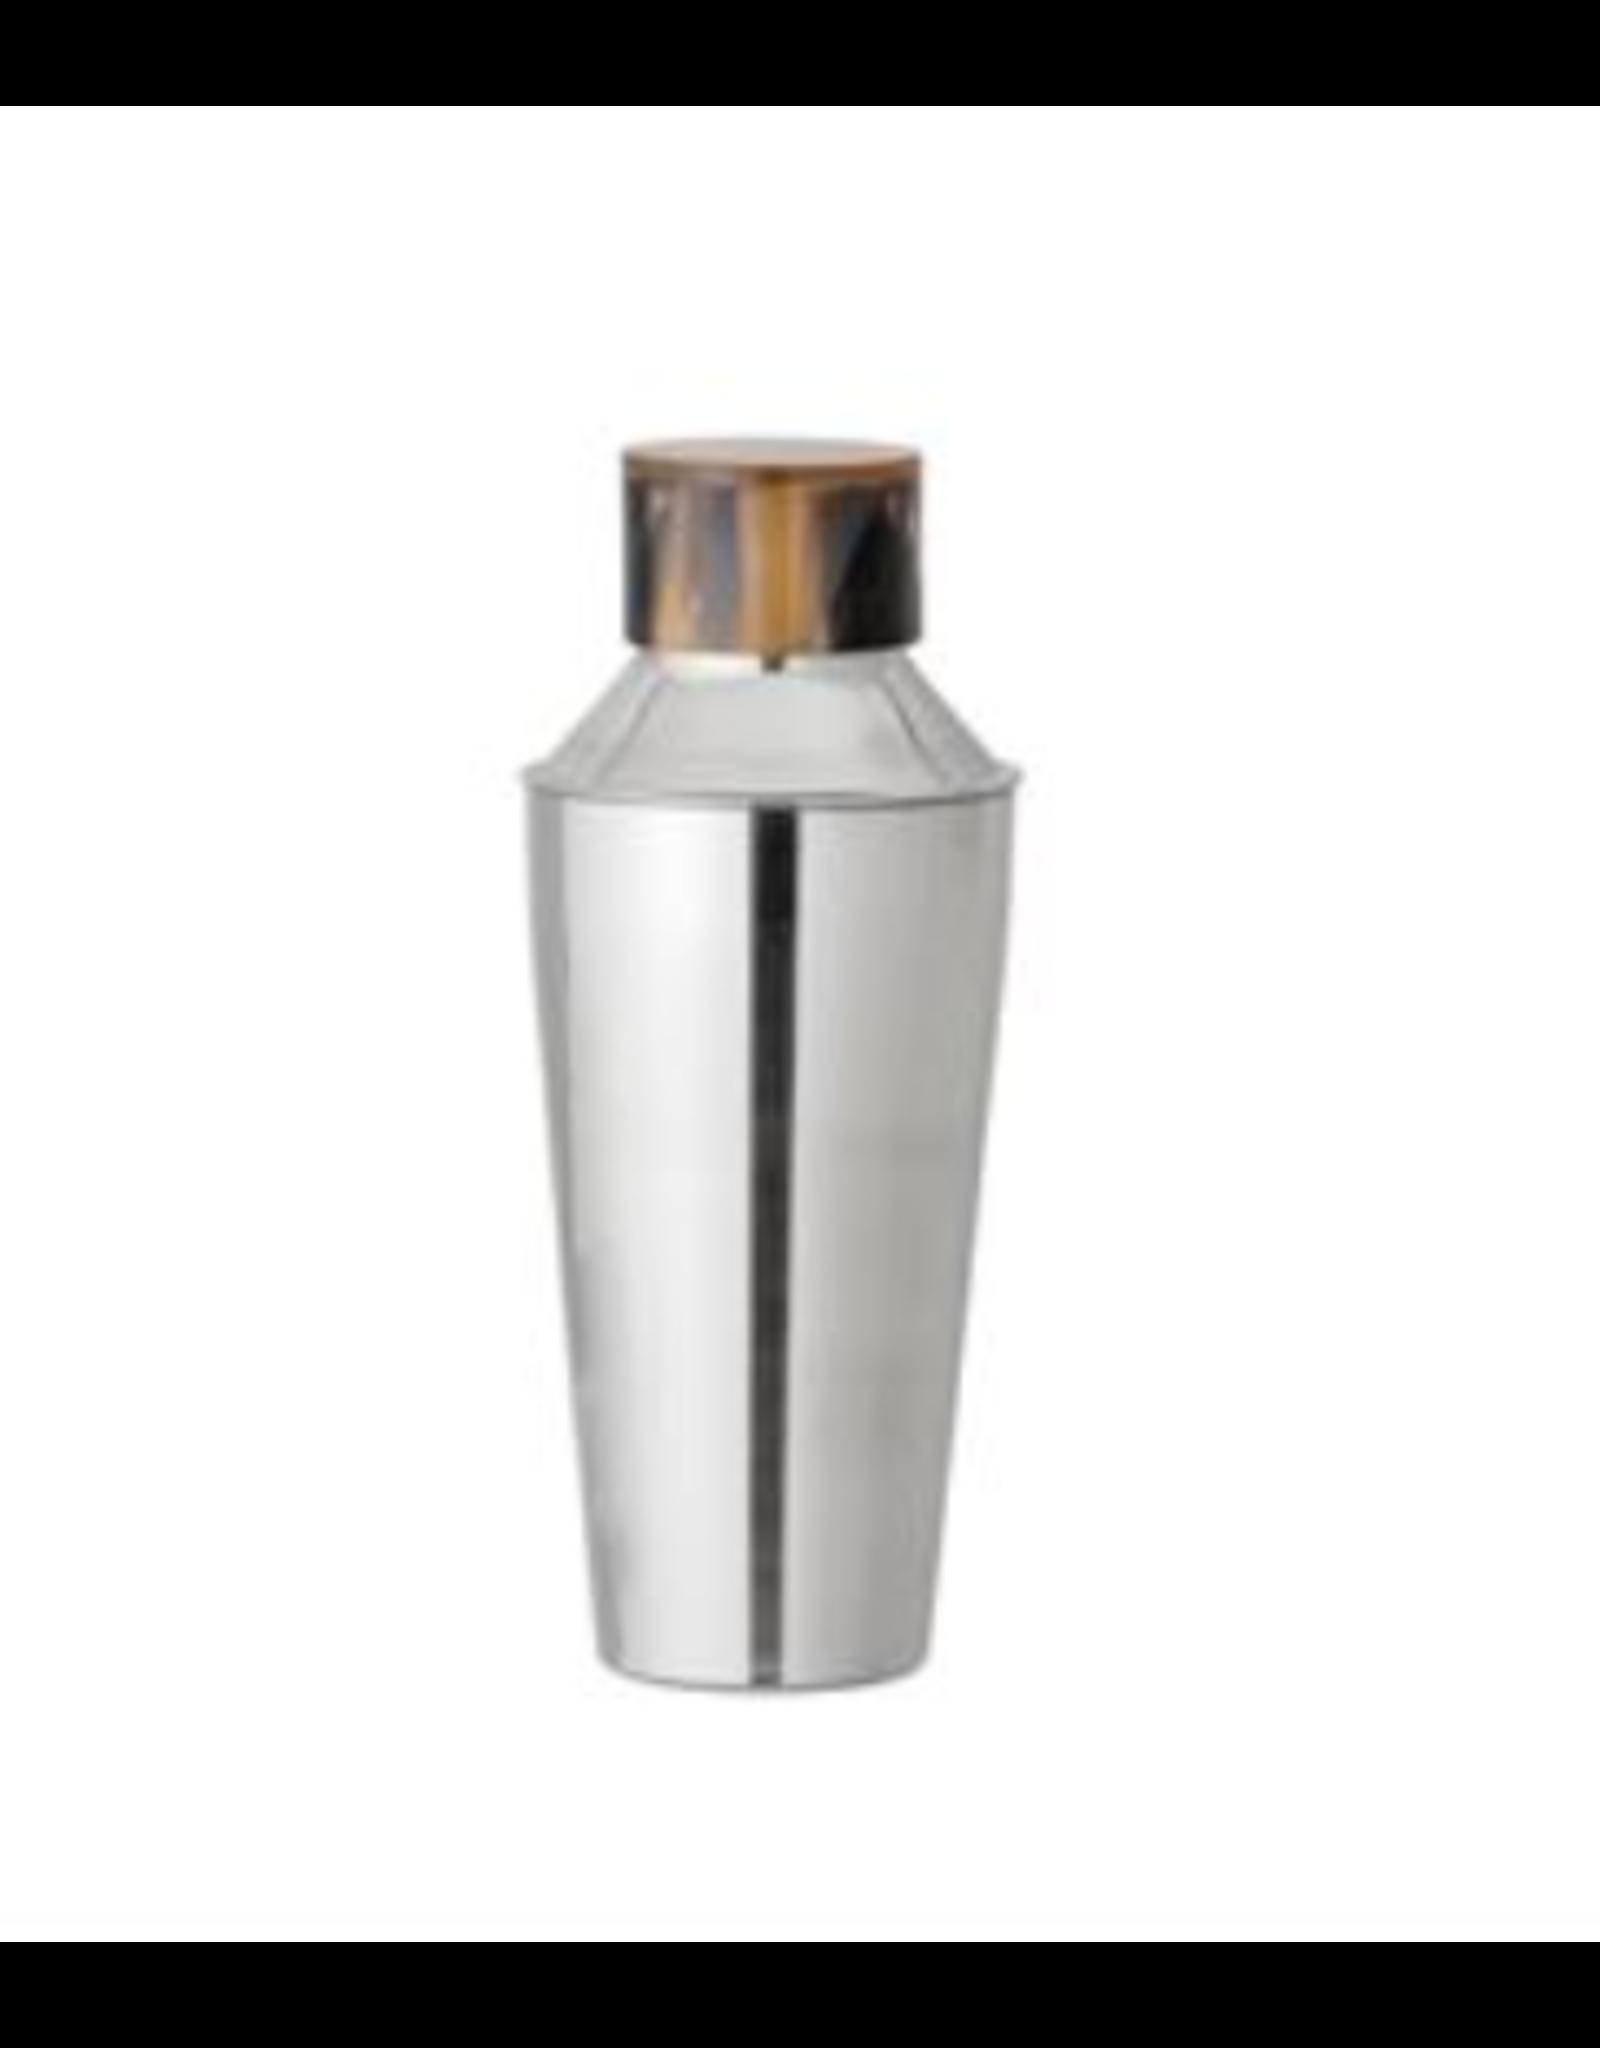 Bloomingville Horn Top Cocktail Shaker, Stainless Steel